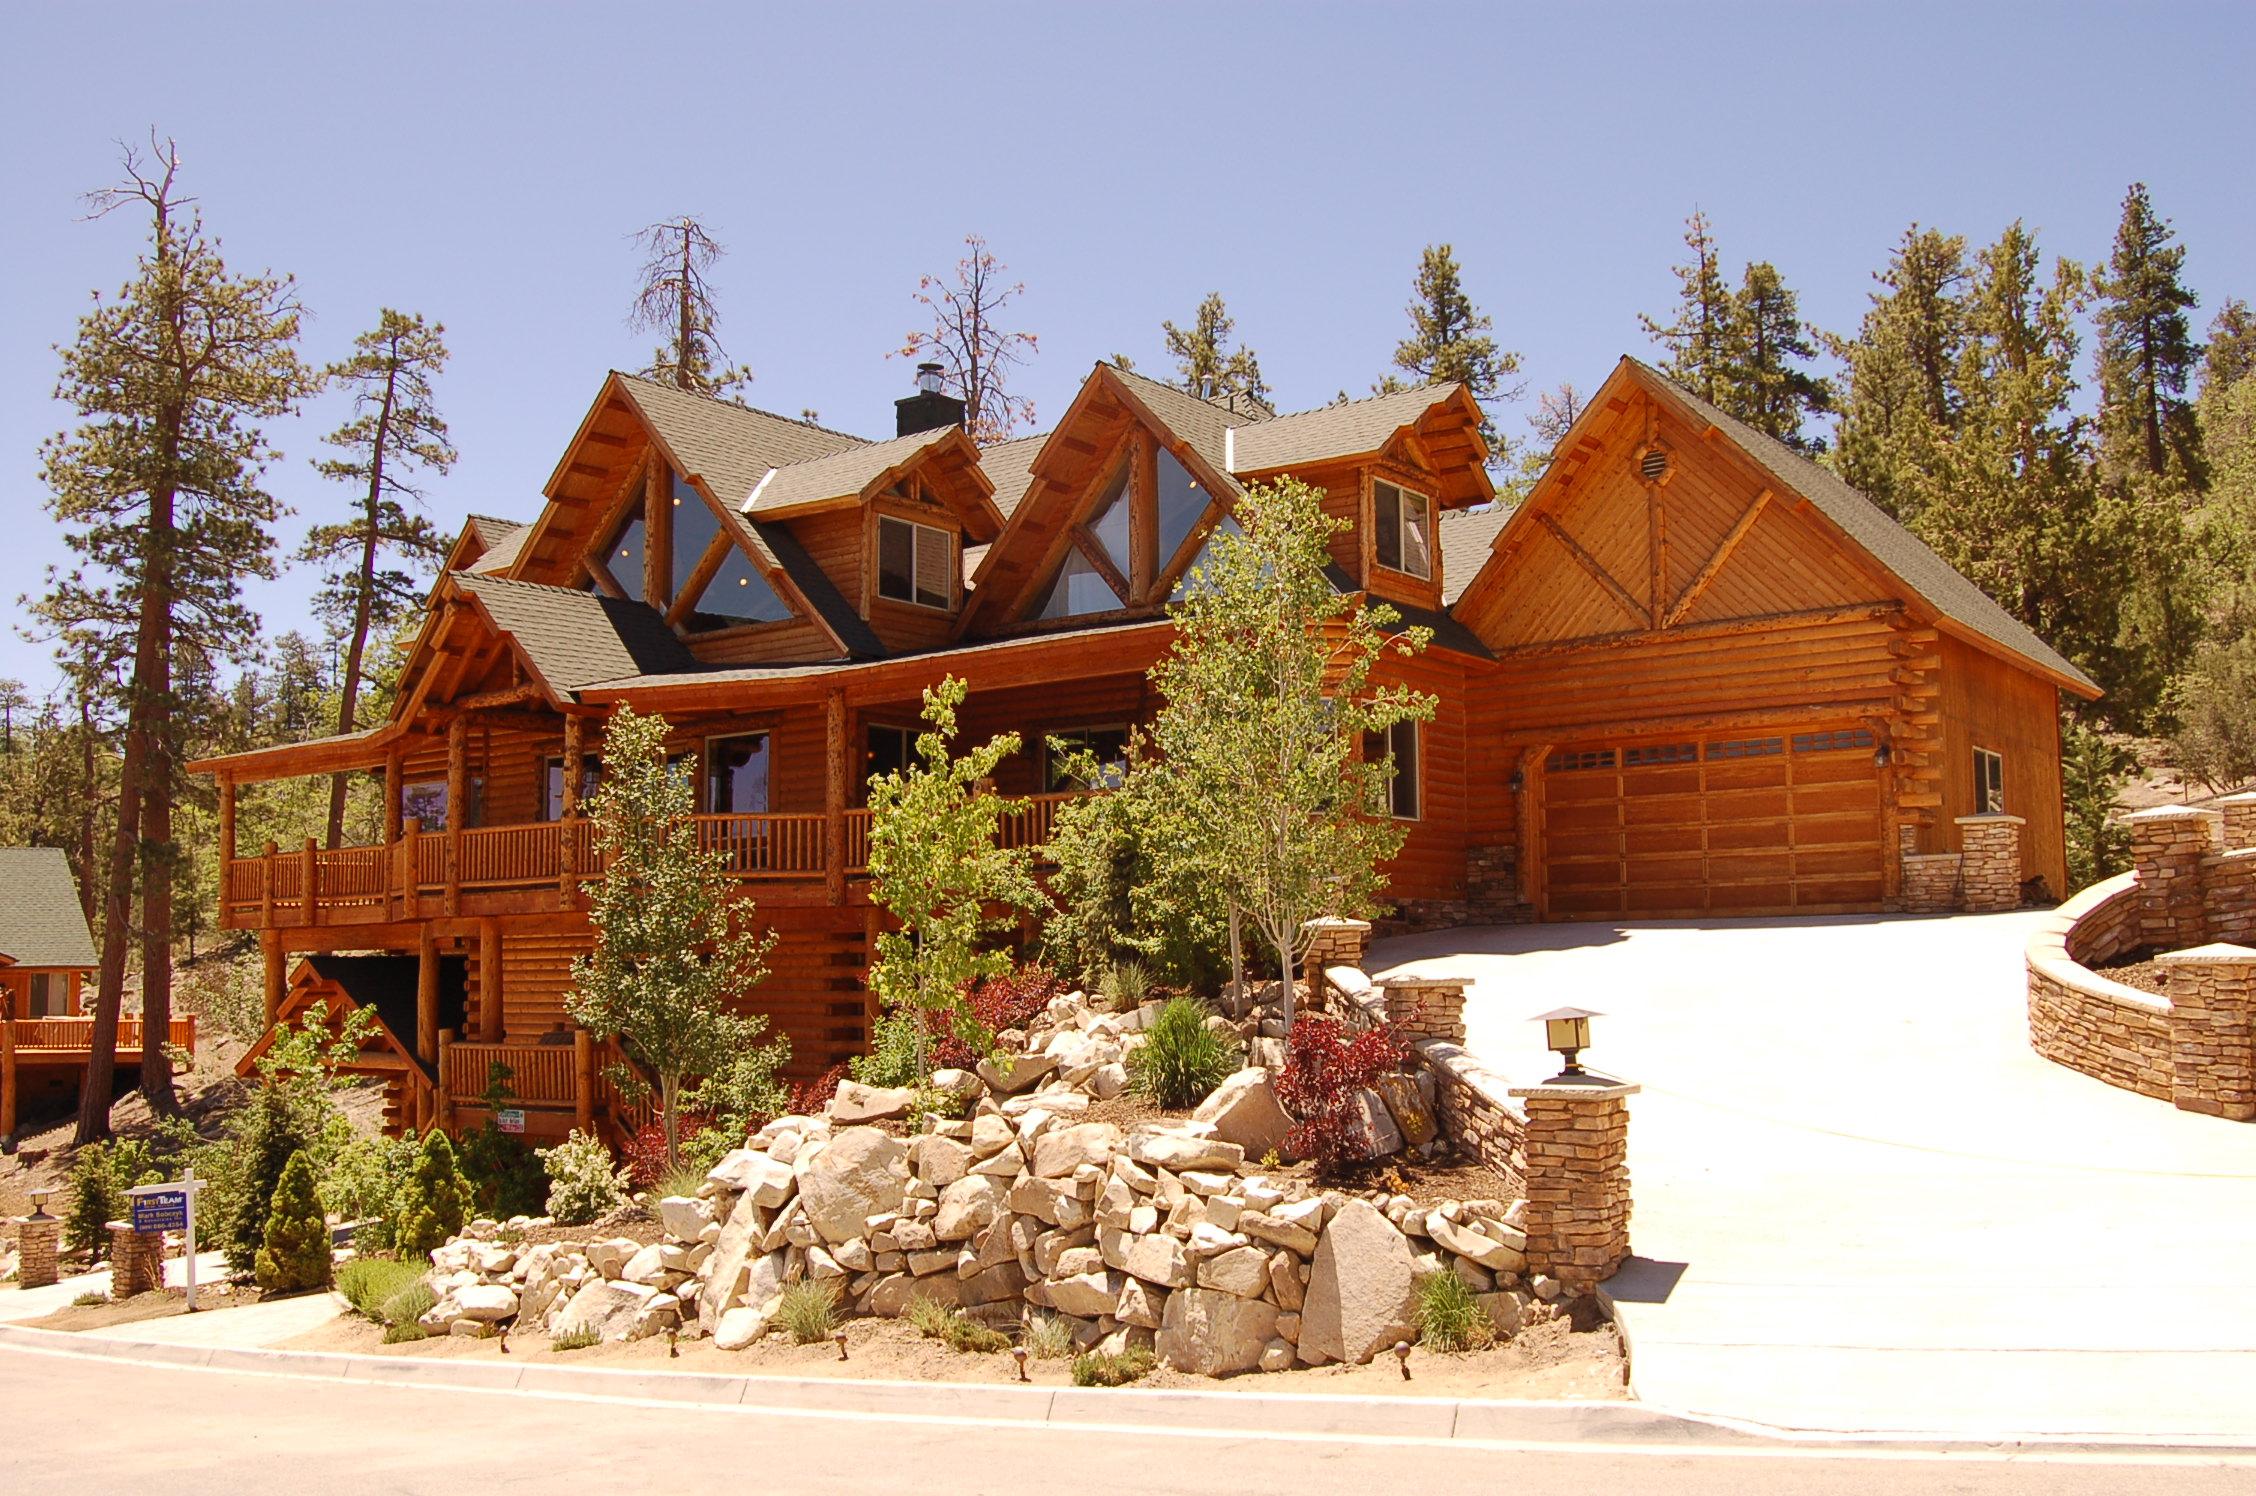 Dream Castle Big Bear Lake Ca 92315 Circlepix